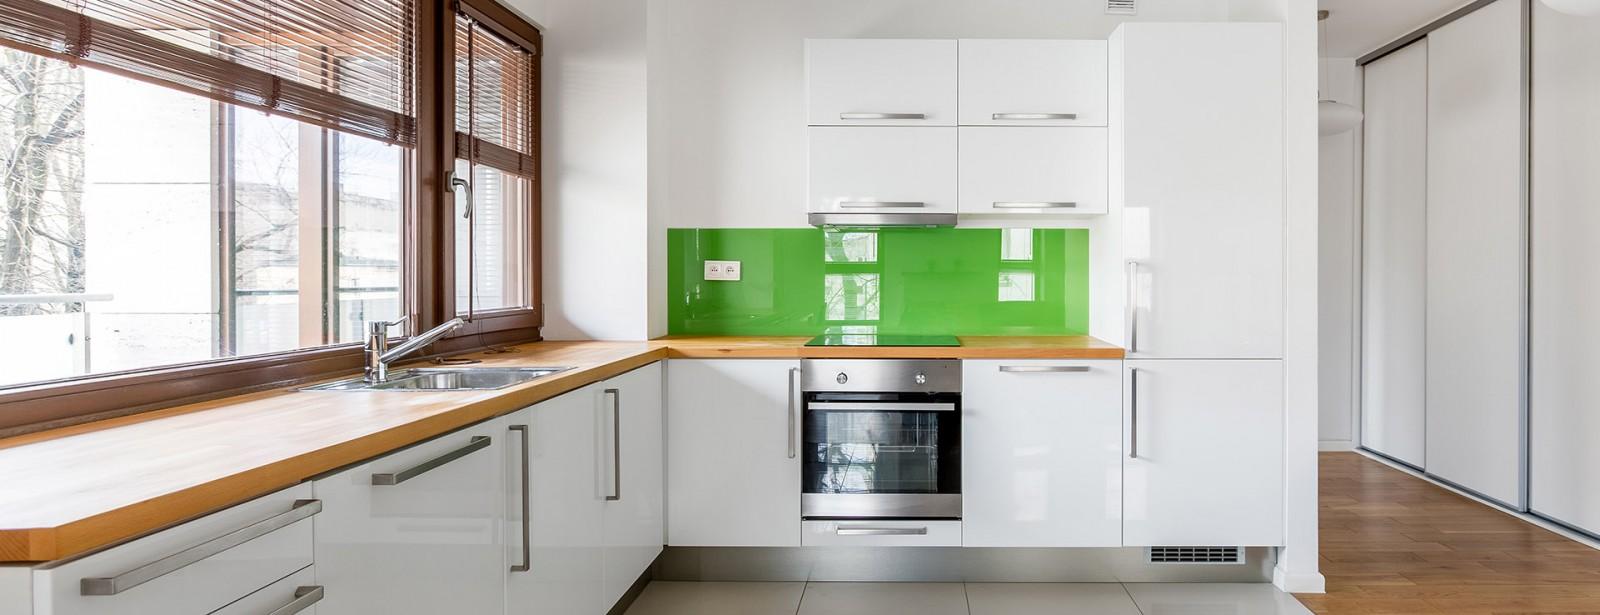 szklany-panel-kuchenny